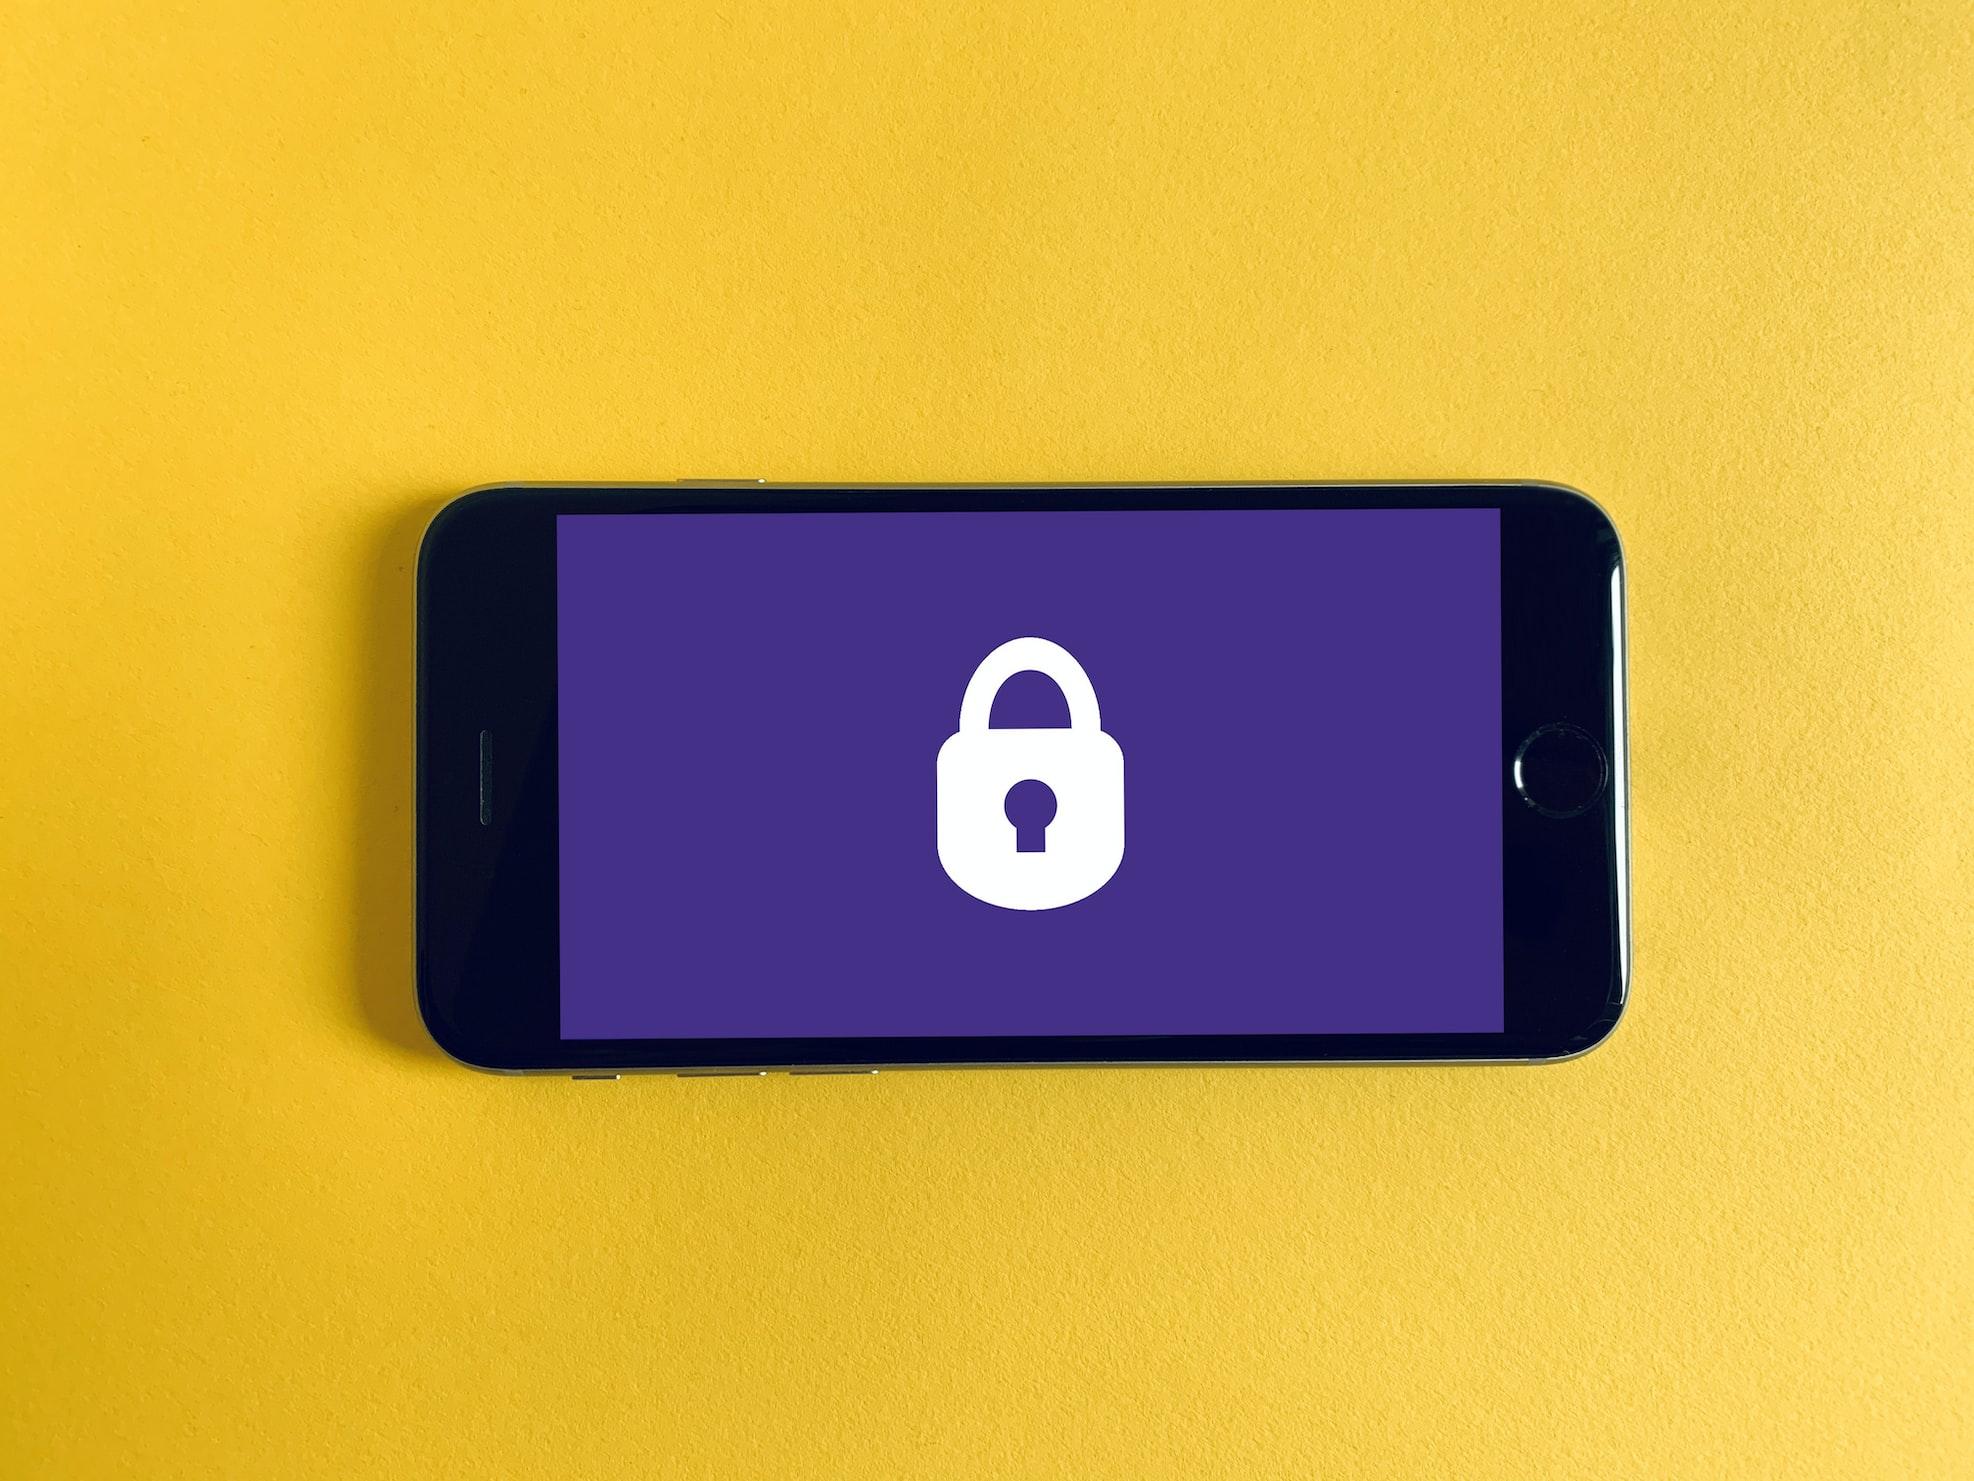 Image of iPhone with lock symbol